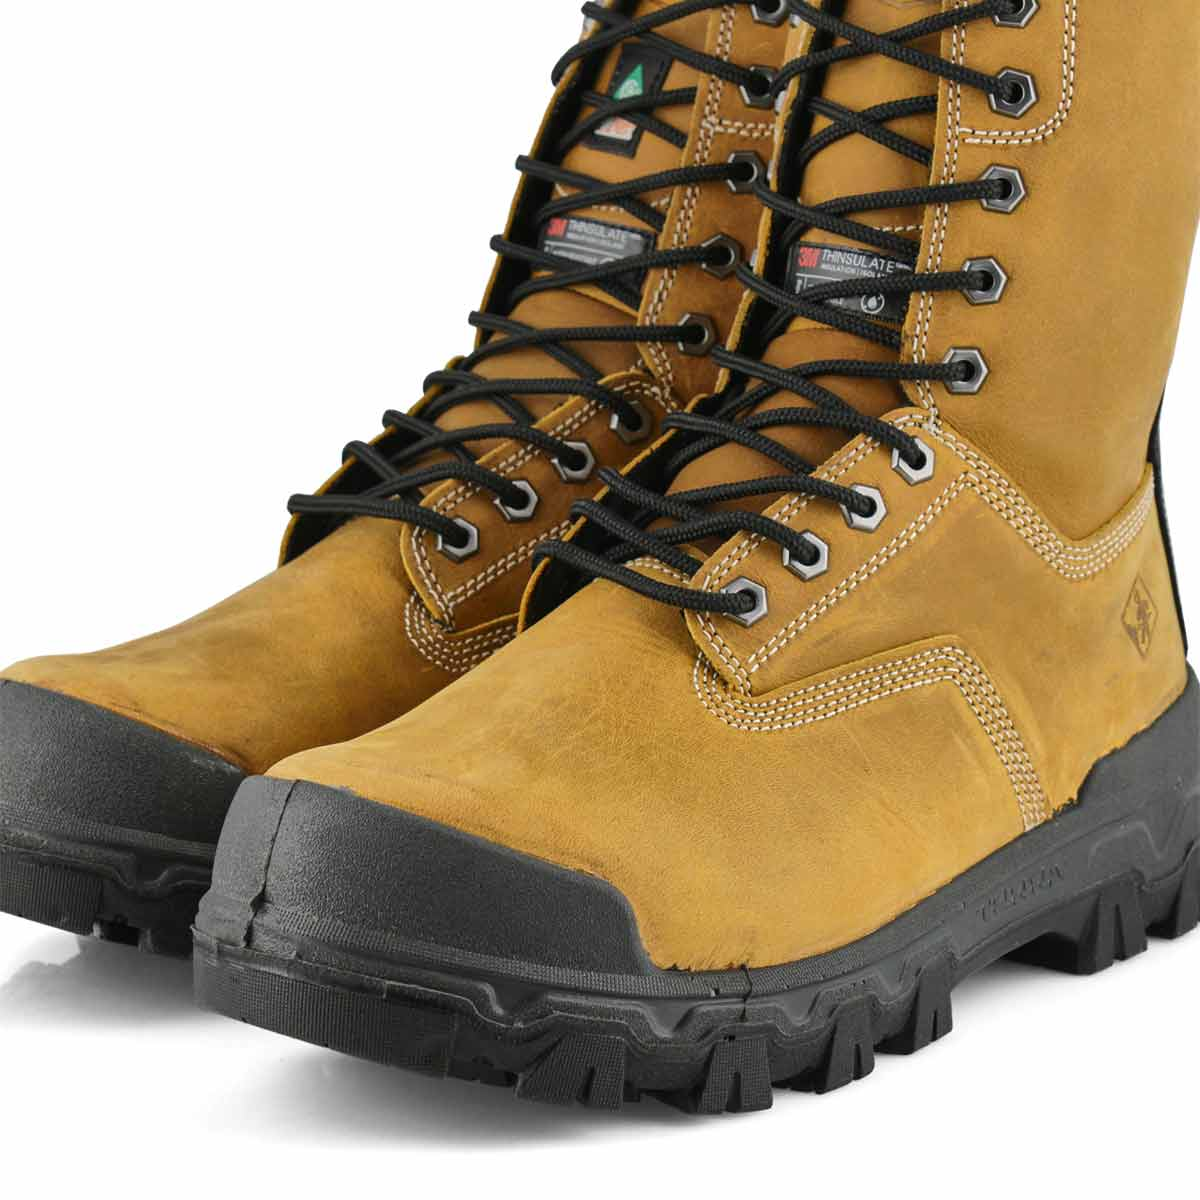 Men's Sentry 8 CSA Boot - Wheat